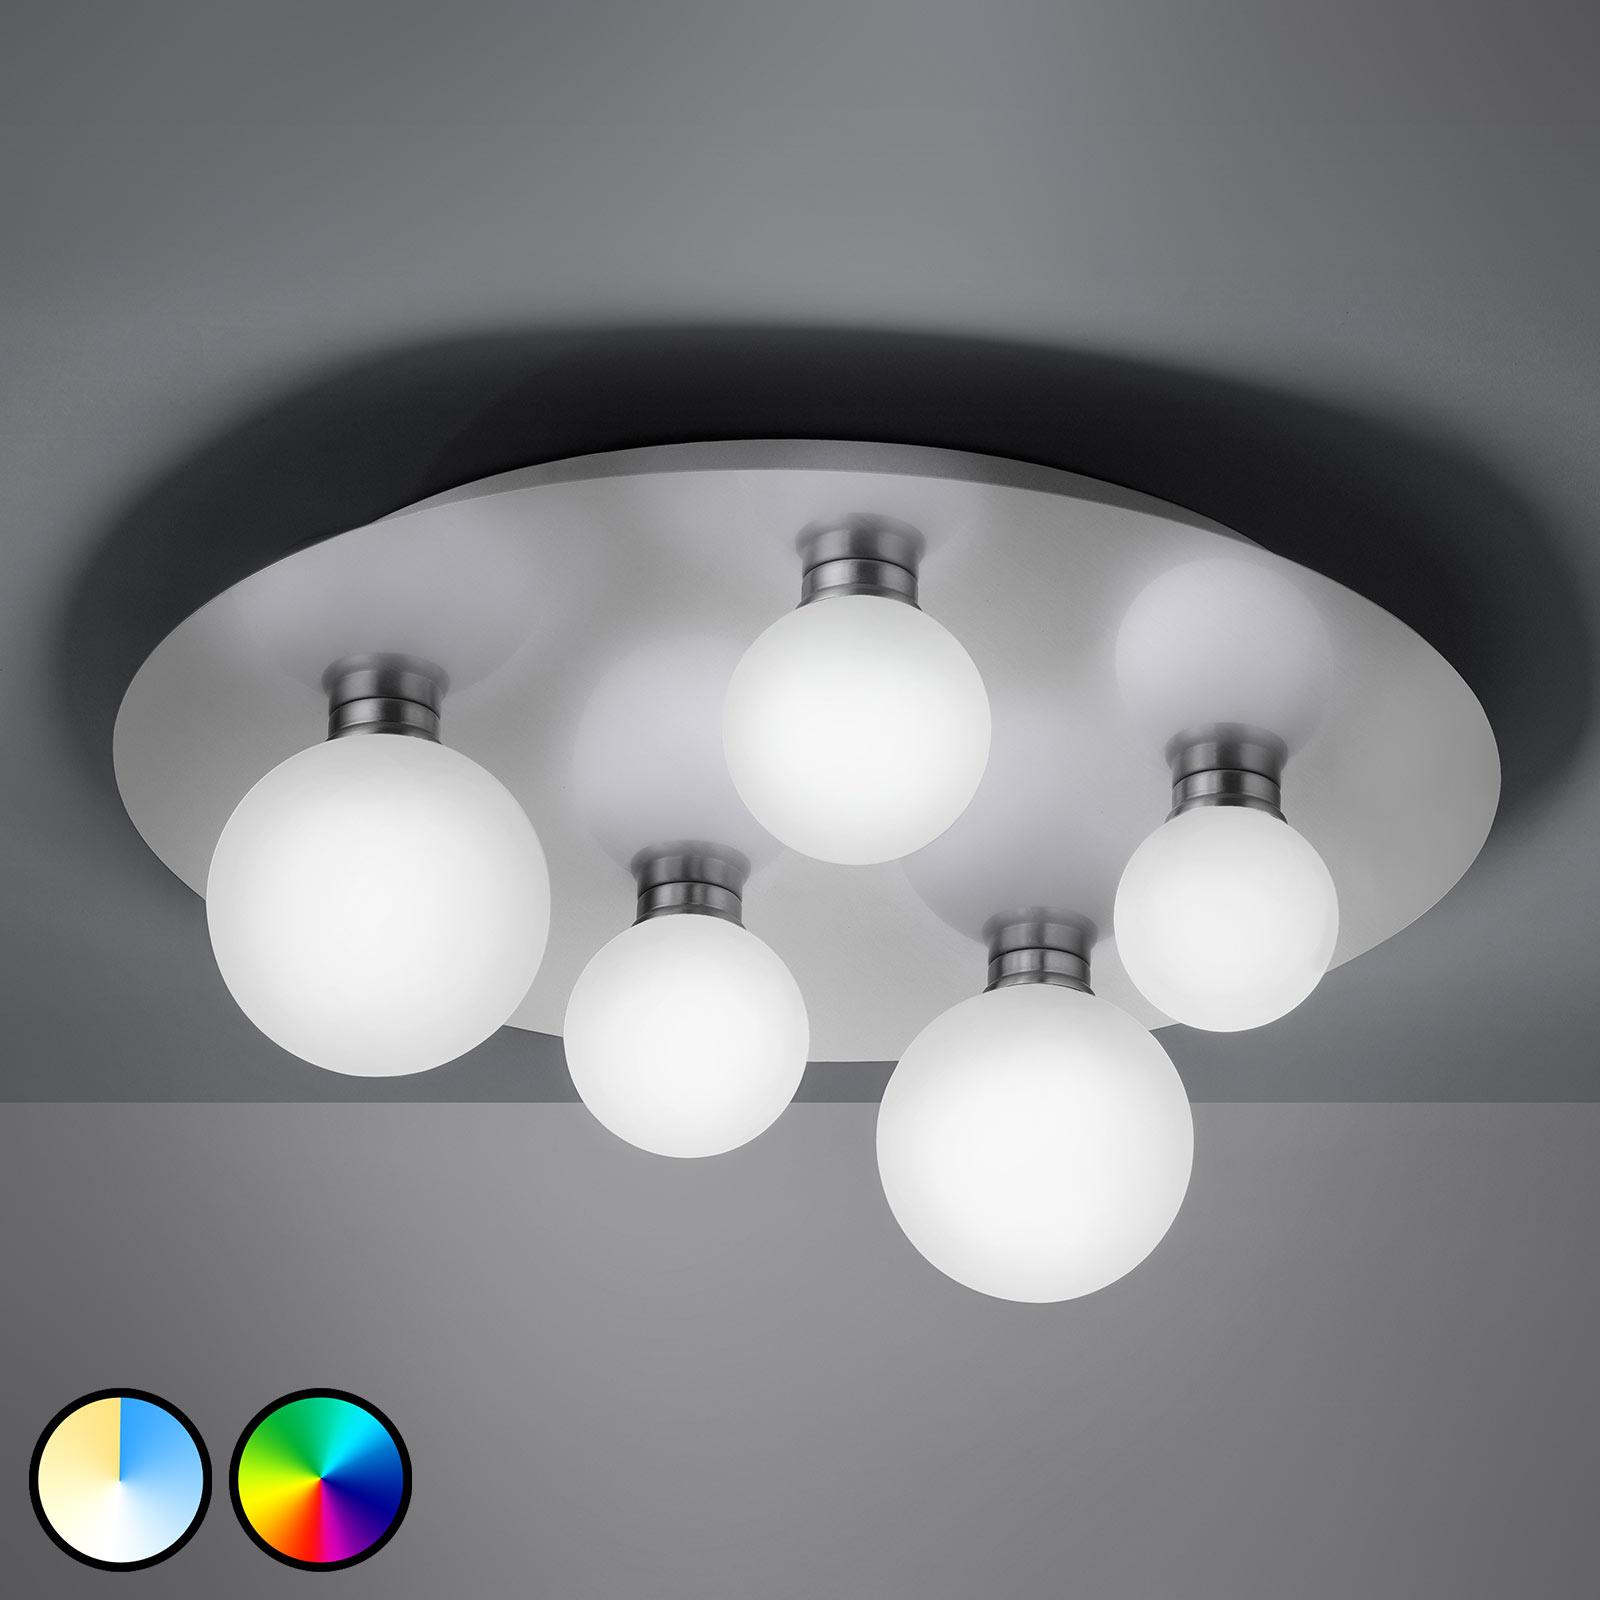 Trio WiZ Dicapo -LED-kattovalaisin, 5-lamppuinen